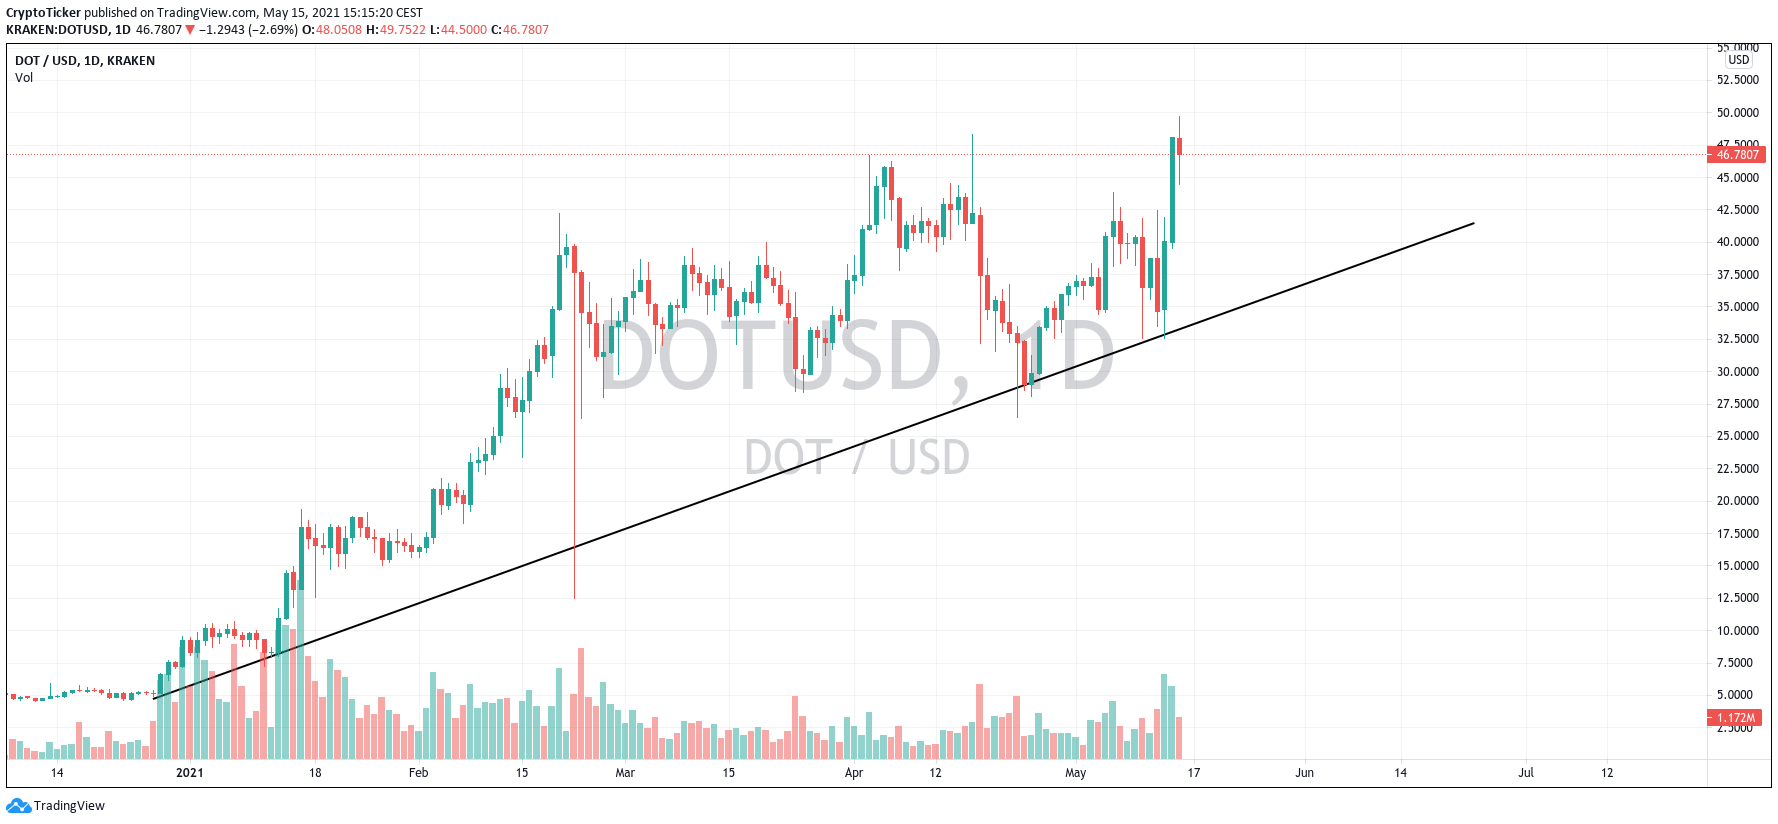 Altcoin Boom: DOT/USD 1-day chart